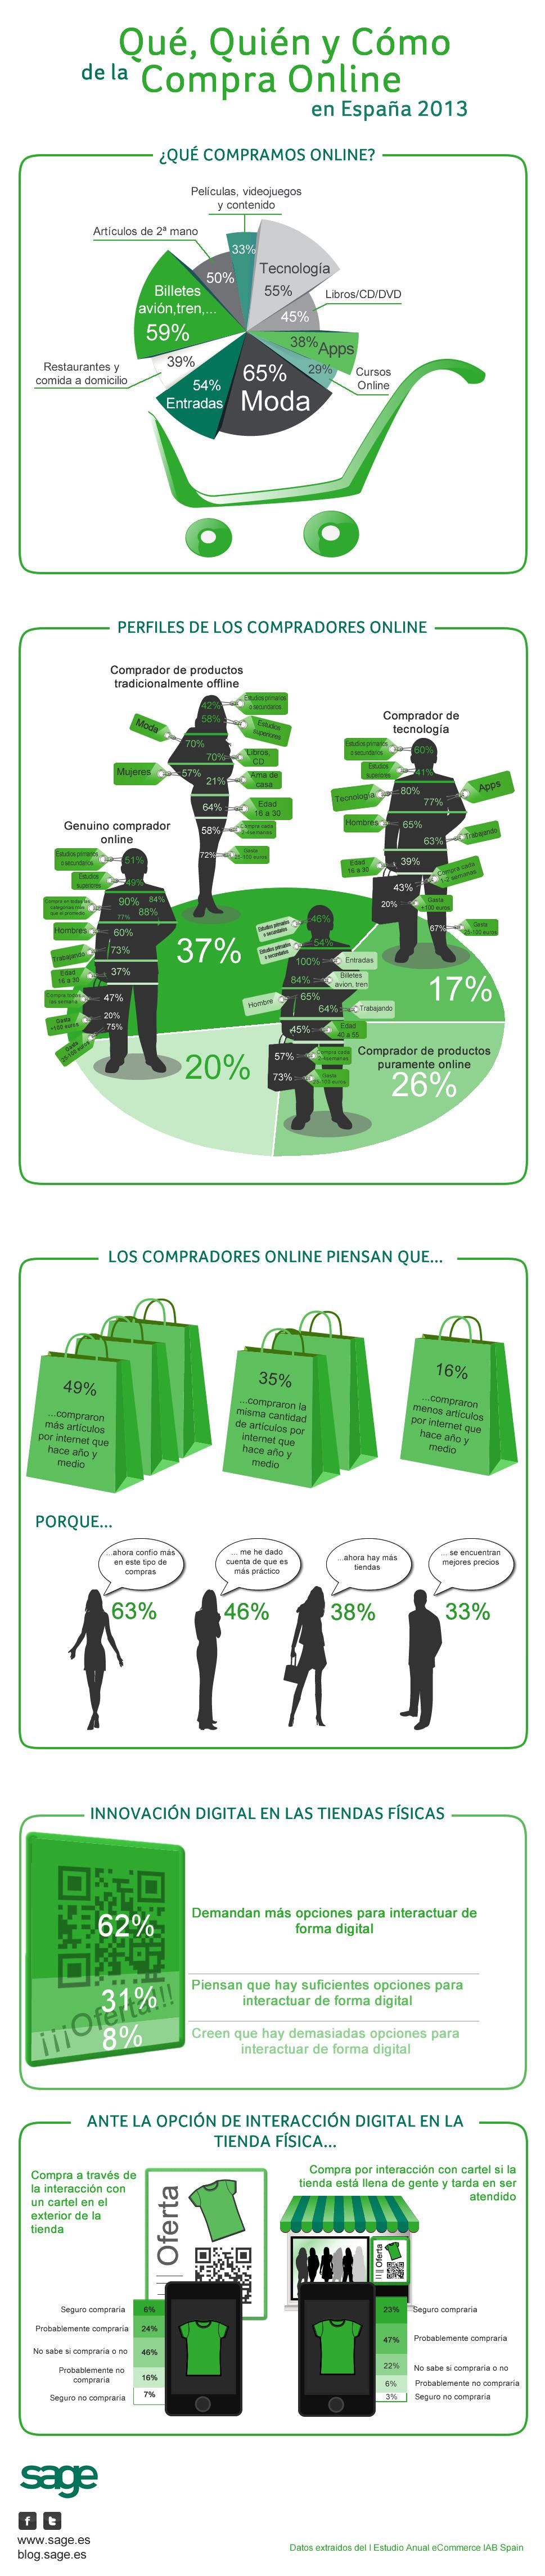 infografia-sage-compradores-online-blog-acens-cloud-hosting